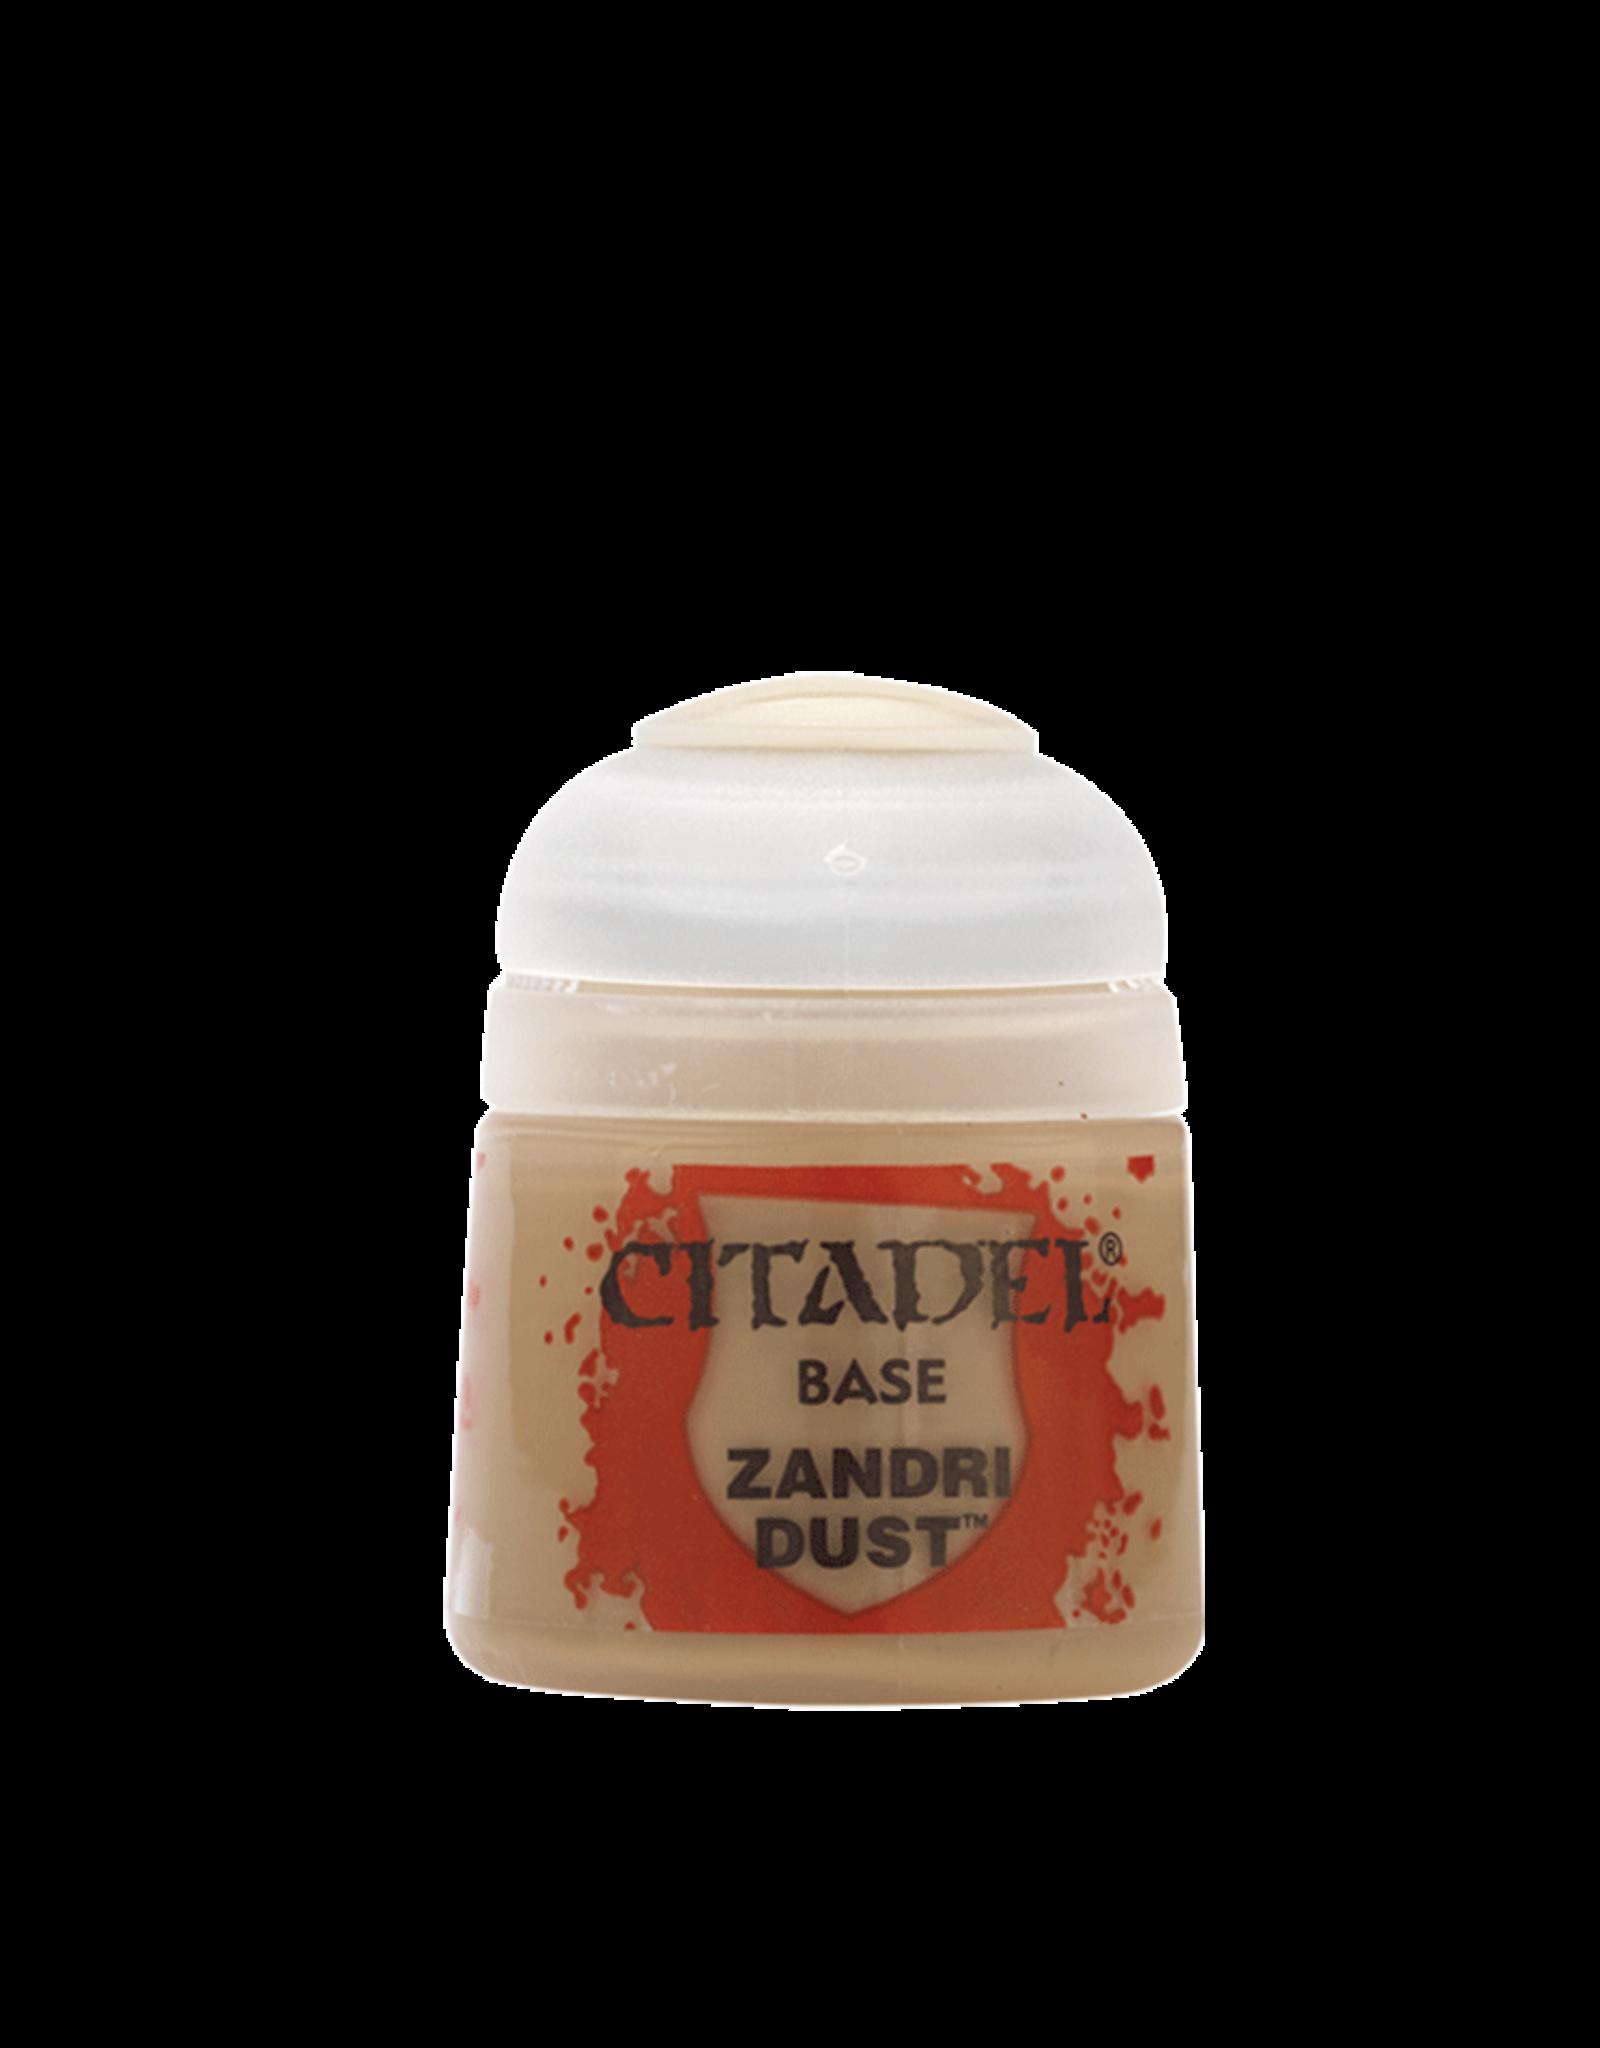 Games Workshop Citadel Base: Zandri Dust